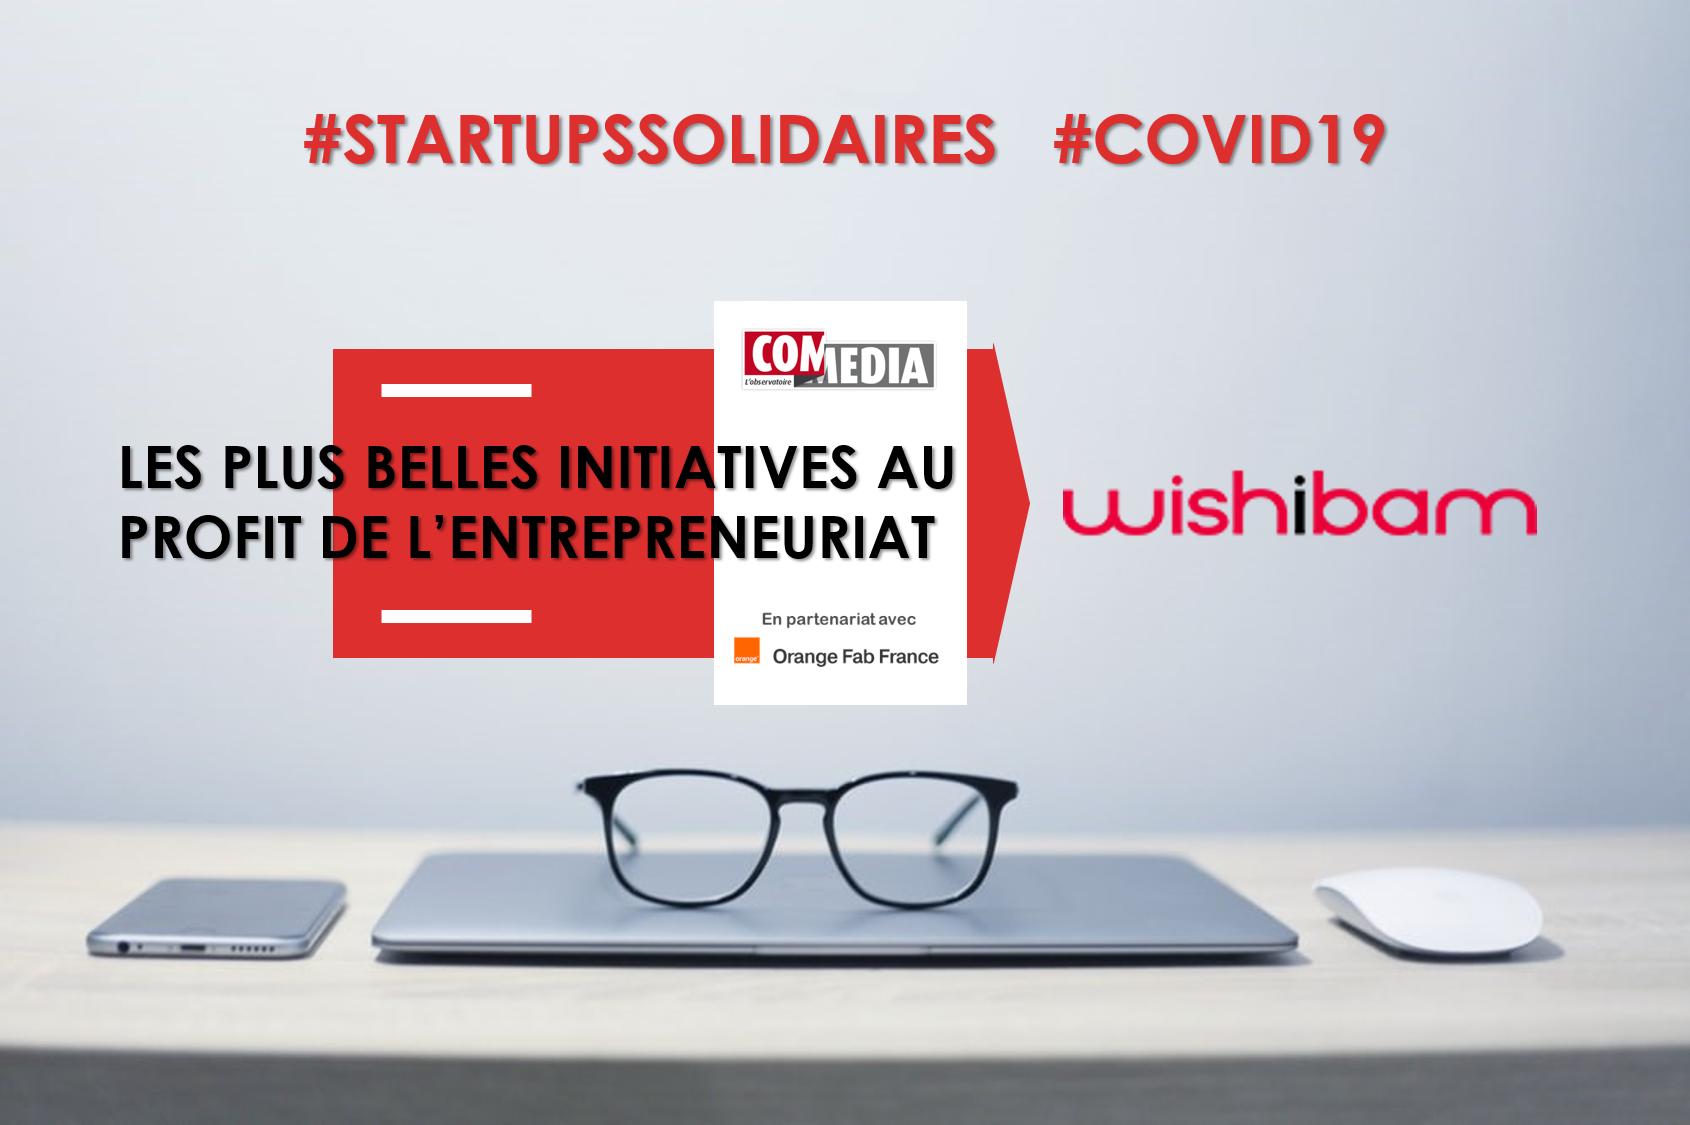 Commedia-Wishibam-StartupSolidaires